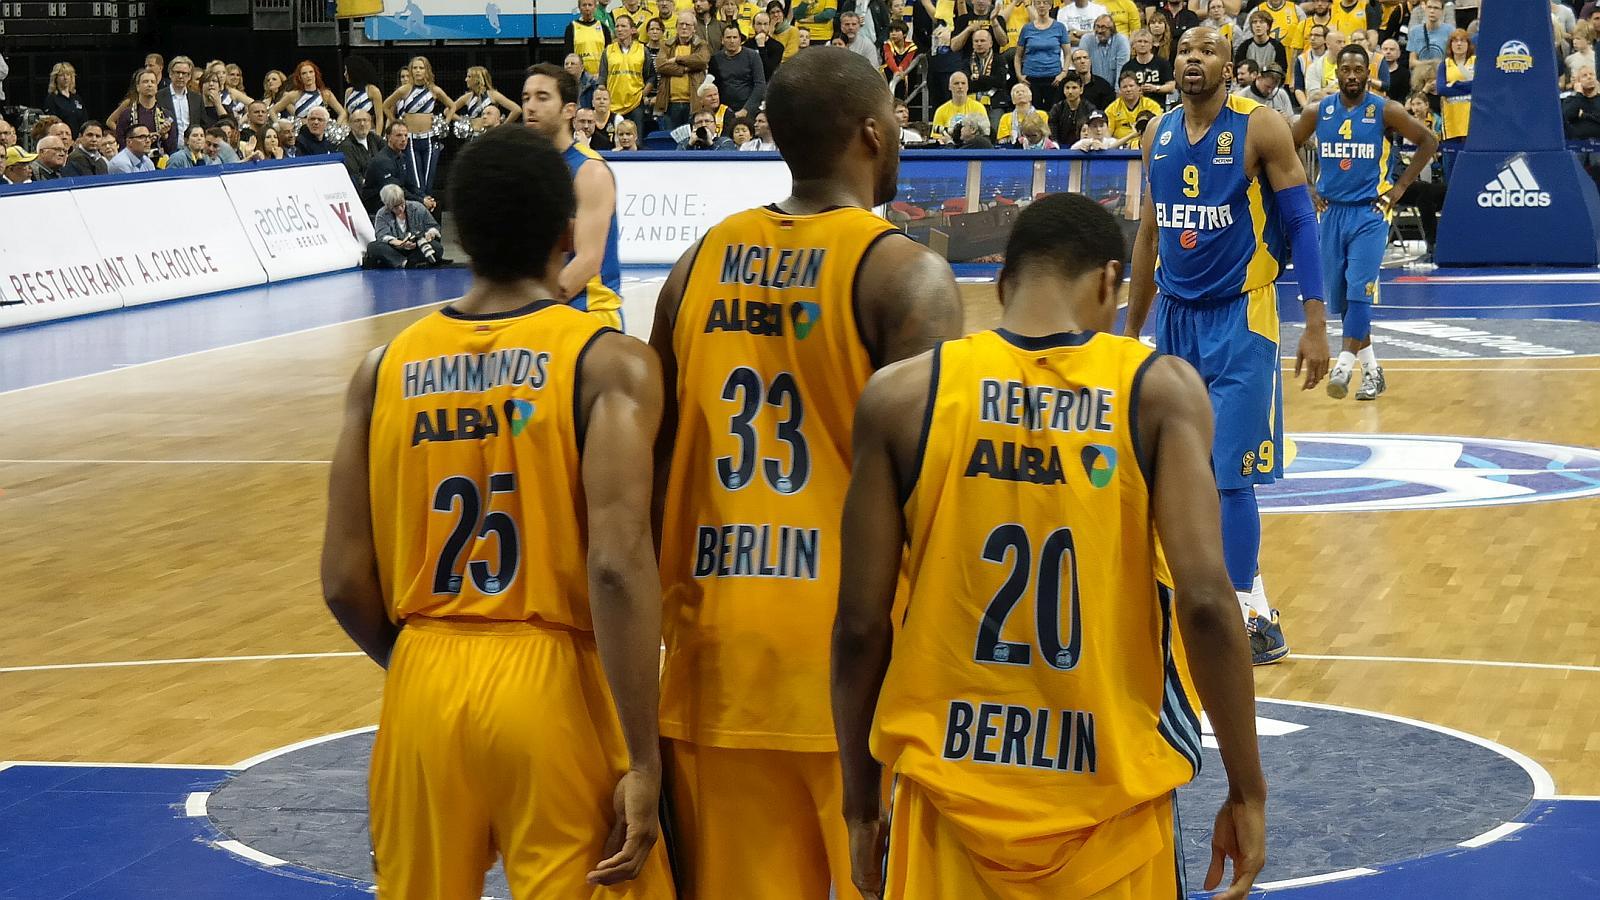 Alba Berlin den Rücken zugekehrt